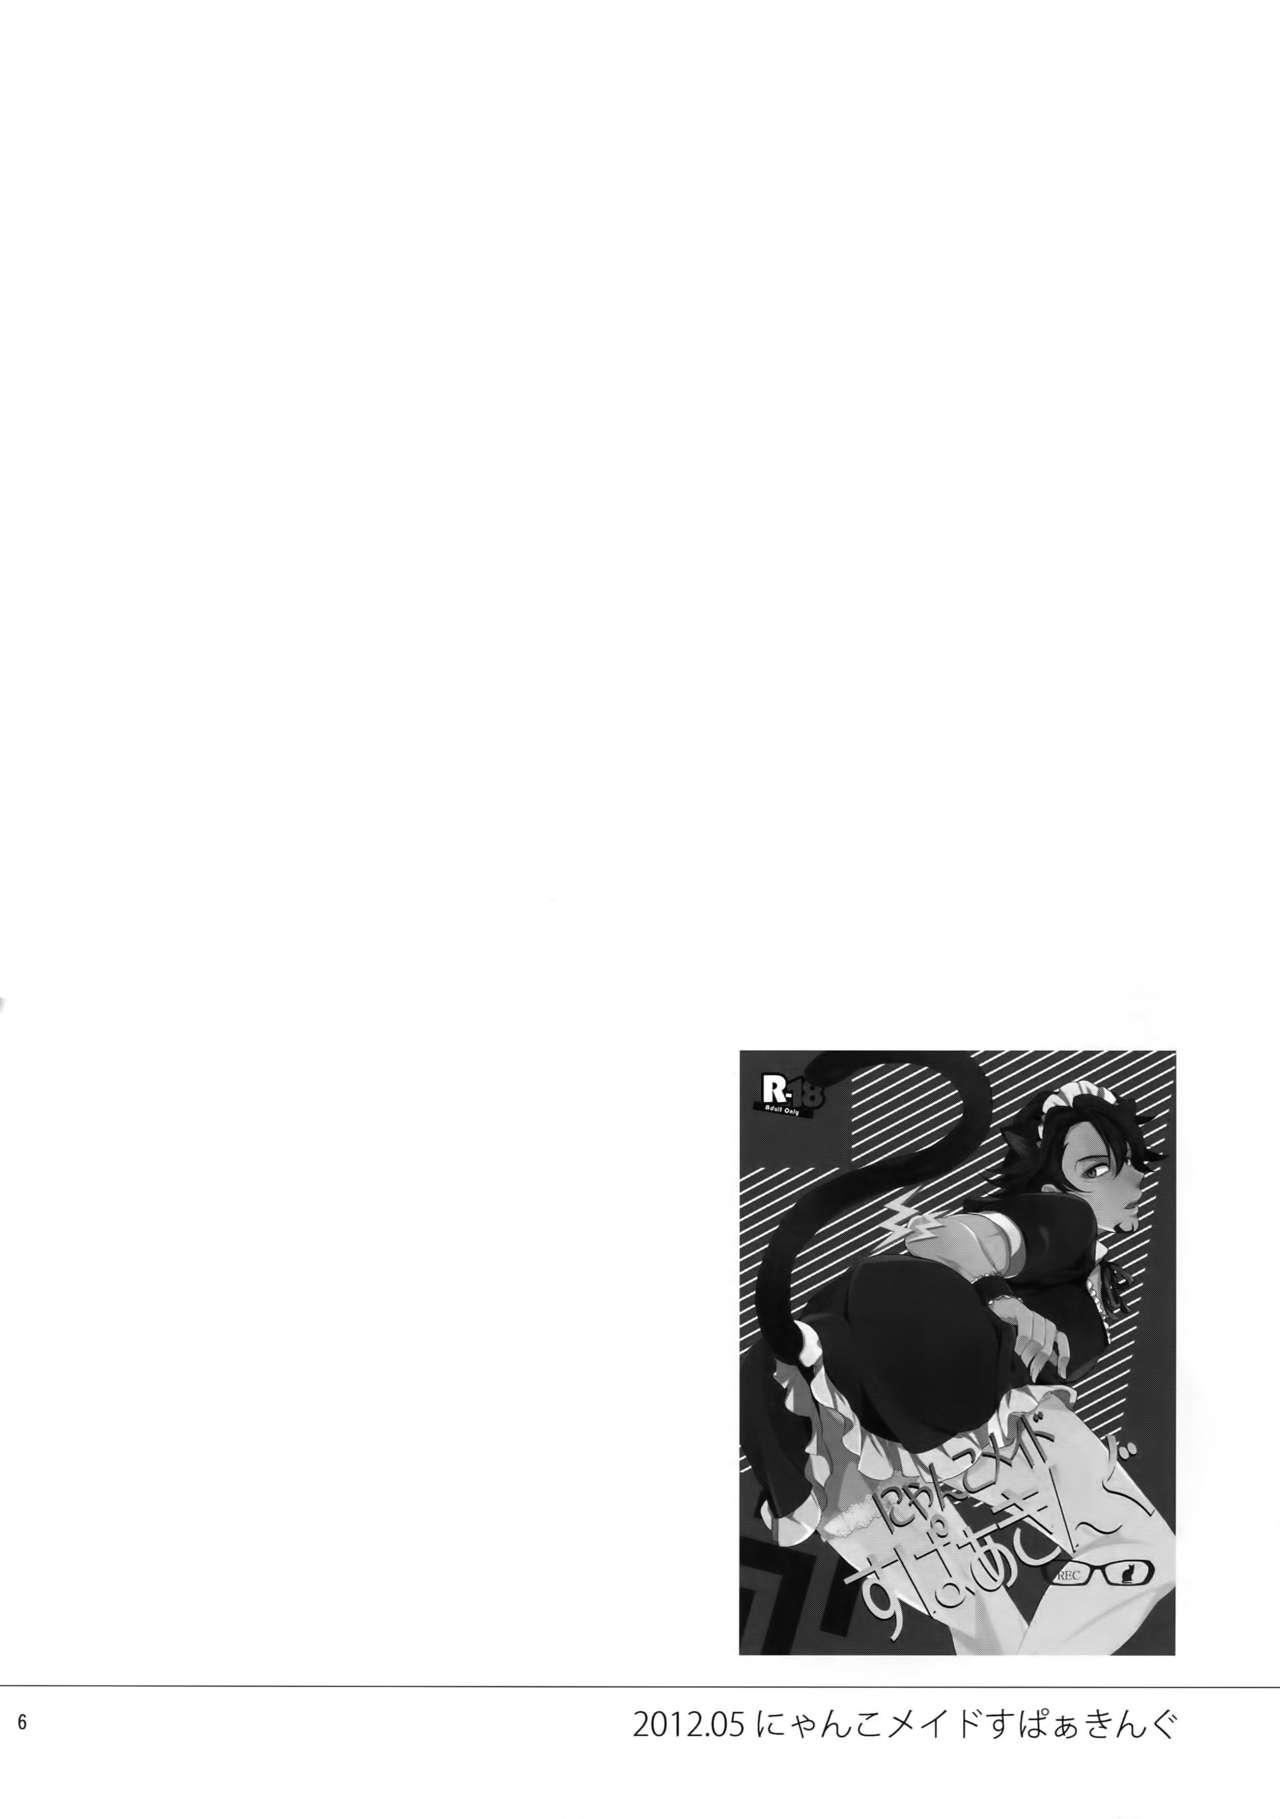 BOROZS Usagi Tora Sairoku 2 4